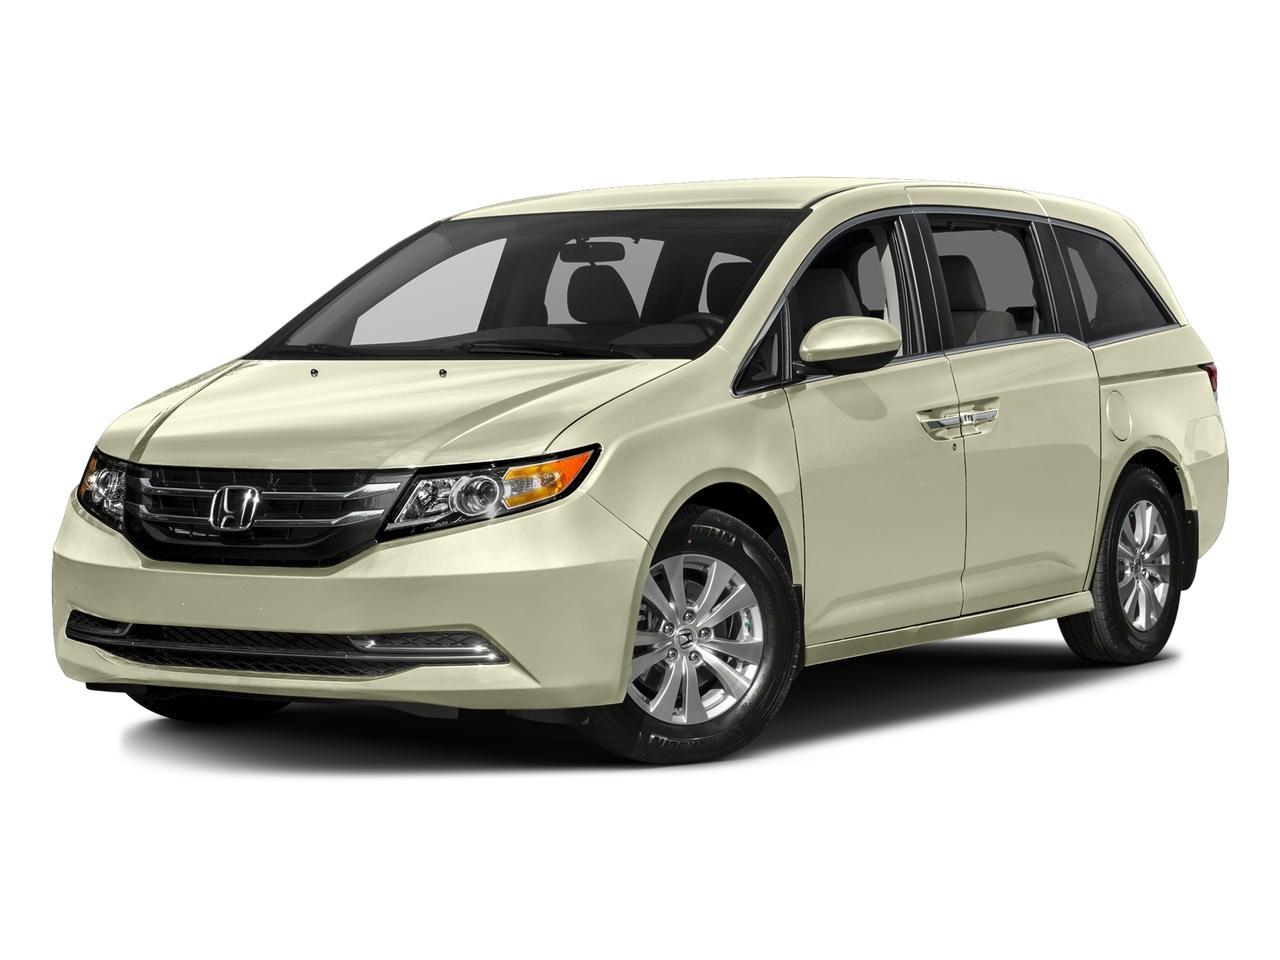 2016 Honda Odyssey Vehicle Photo in San Antonio, TX 78238